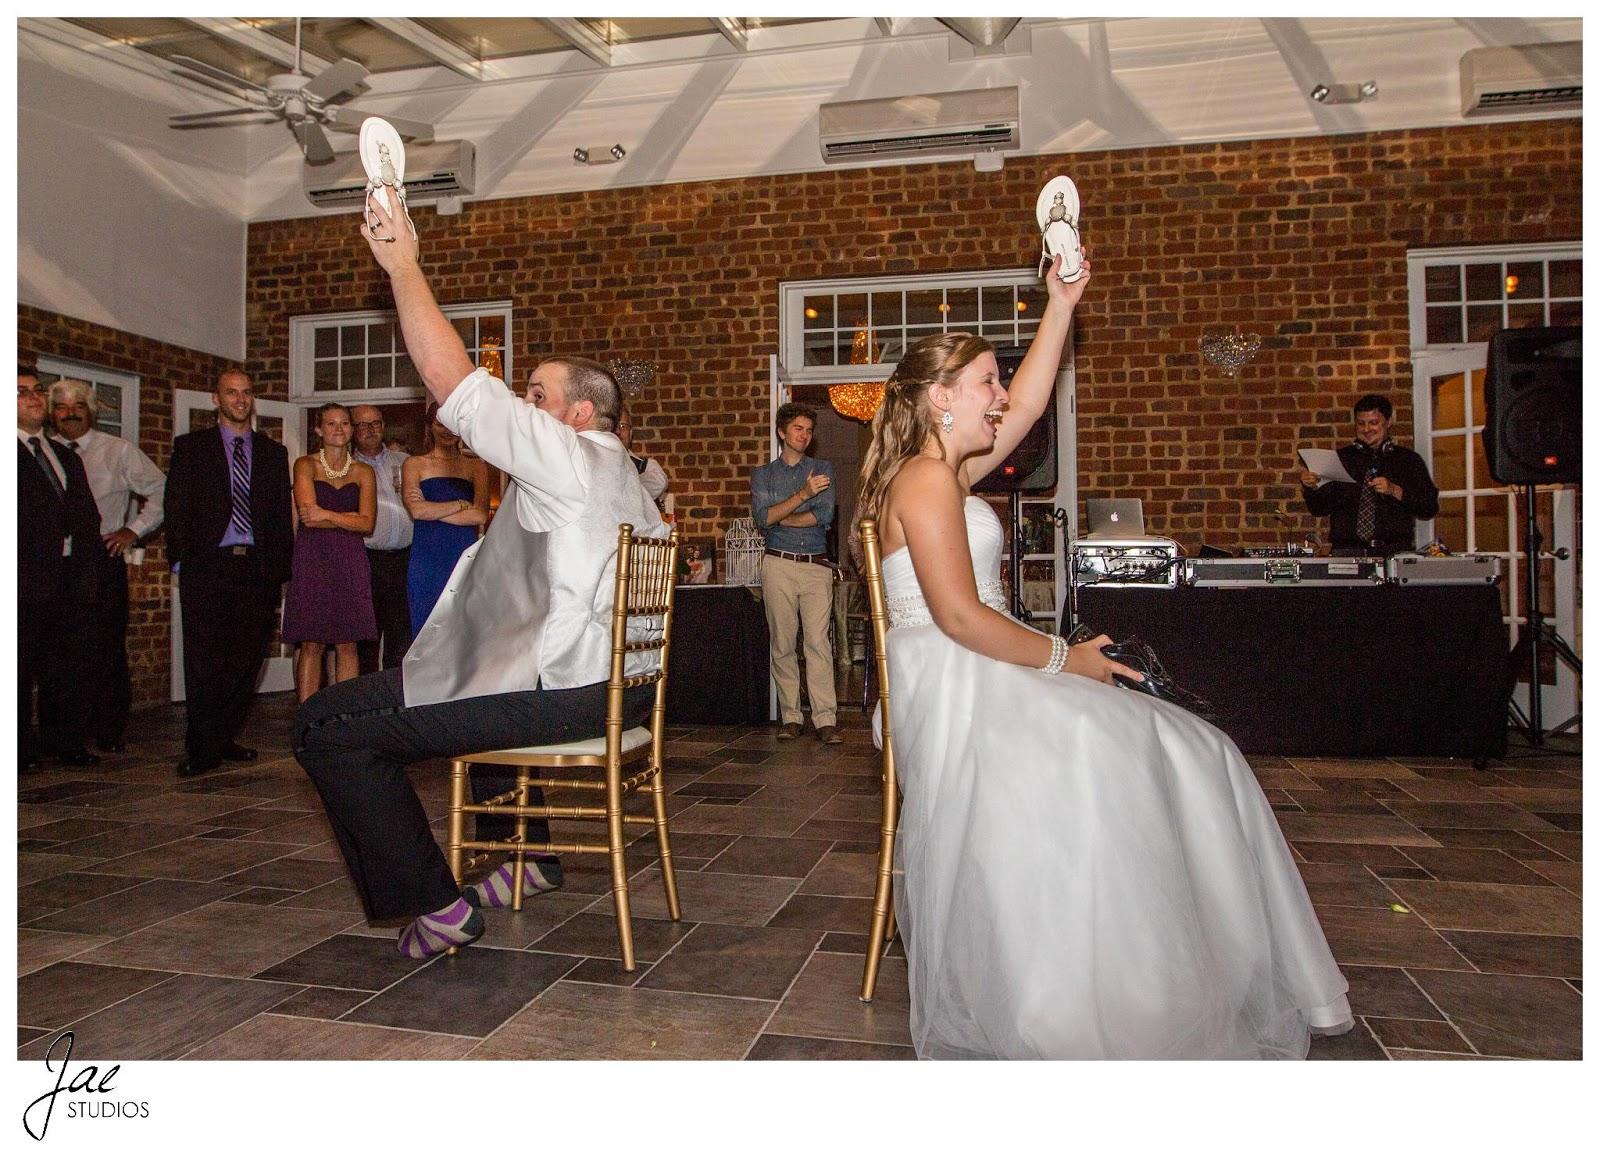 Jonathan and Julie, Bird cage, West Manor Estate, Wedding, Lynchburg, Virginia, Jae Studios, bride, groom, game, shoes, wedding dress, tuxedo, reception